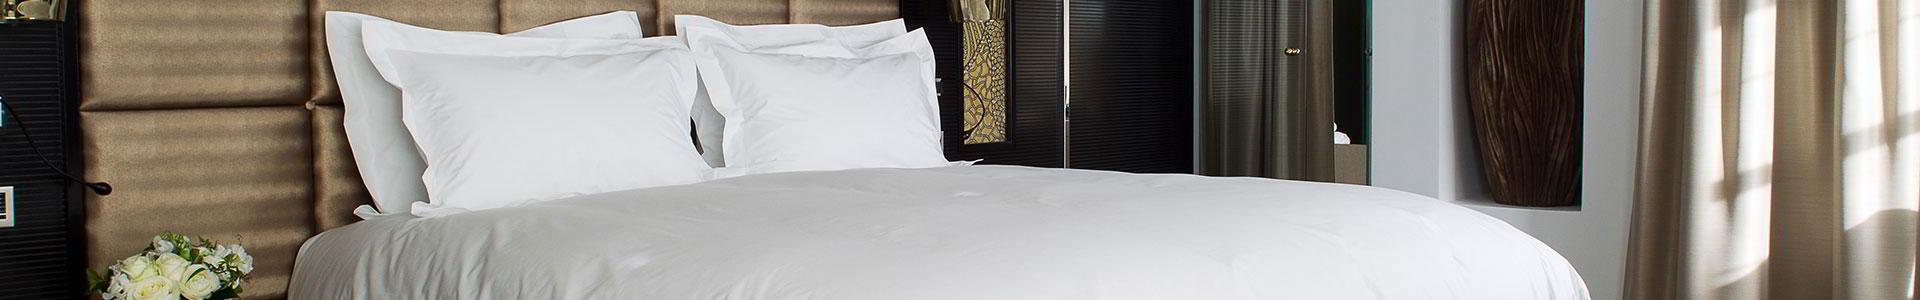 sofitel collection percale achat draps luxe coton hotel. Black Bedroom Furniture Sets. Home Design Ideas